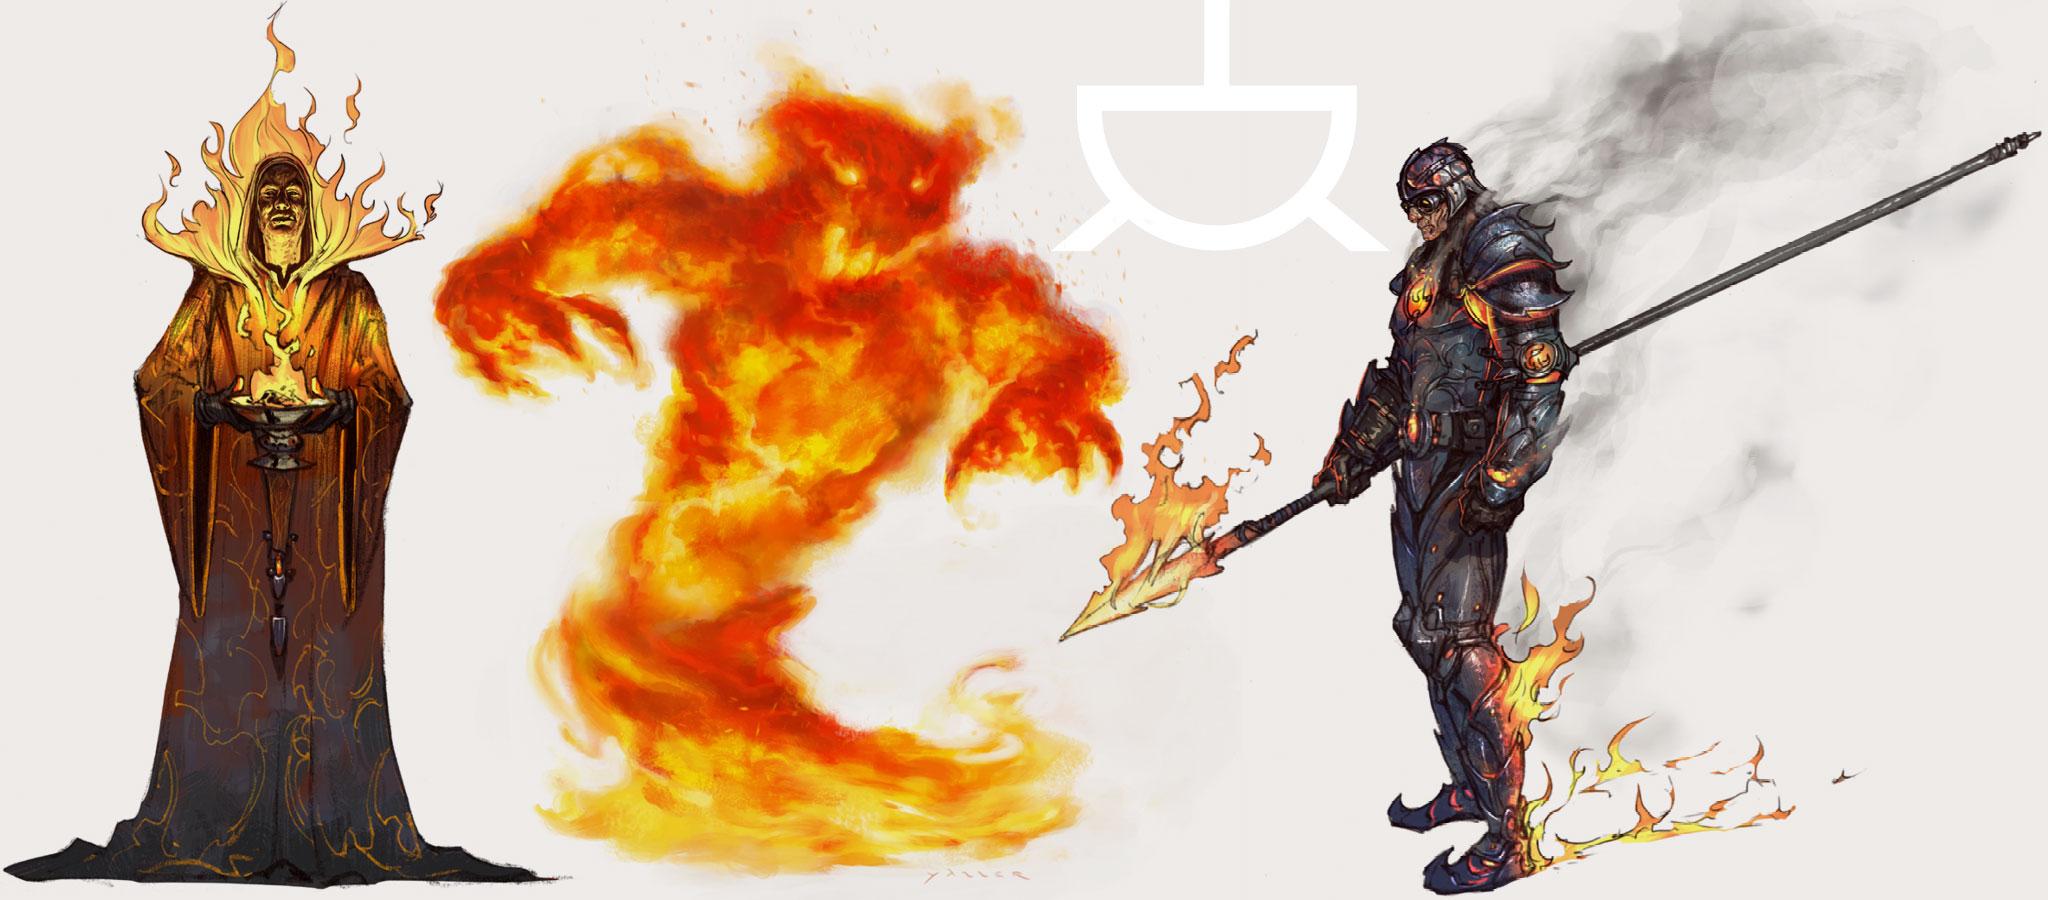 culto do fogo